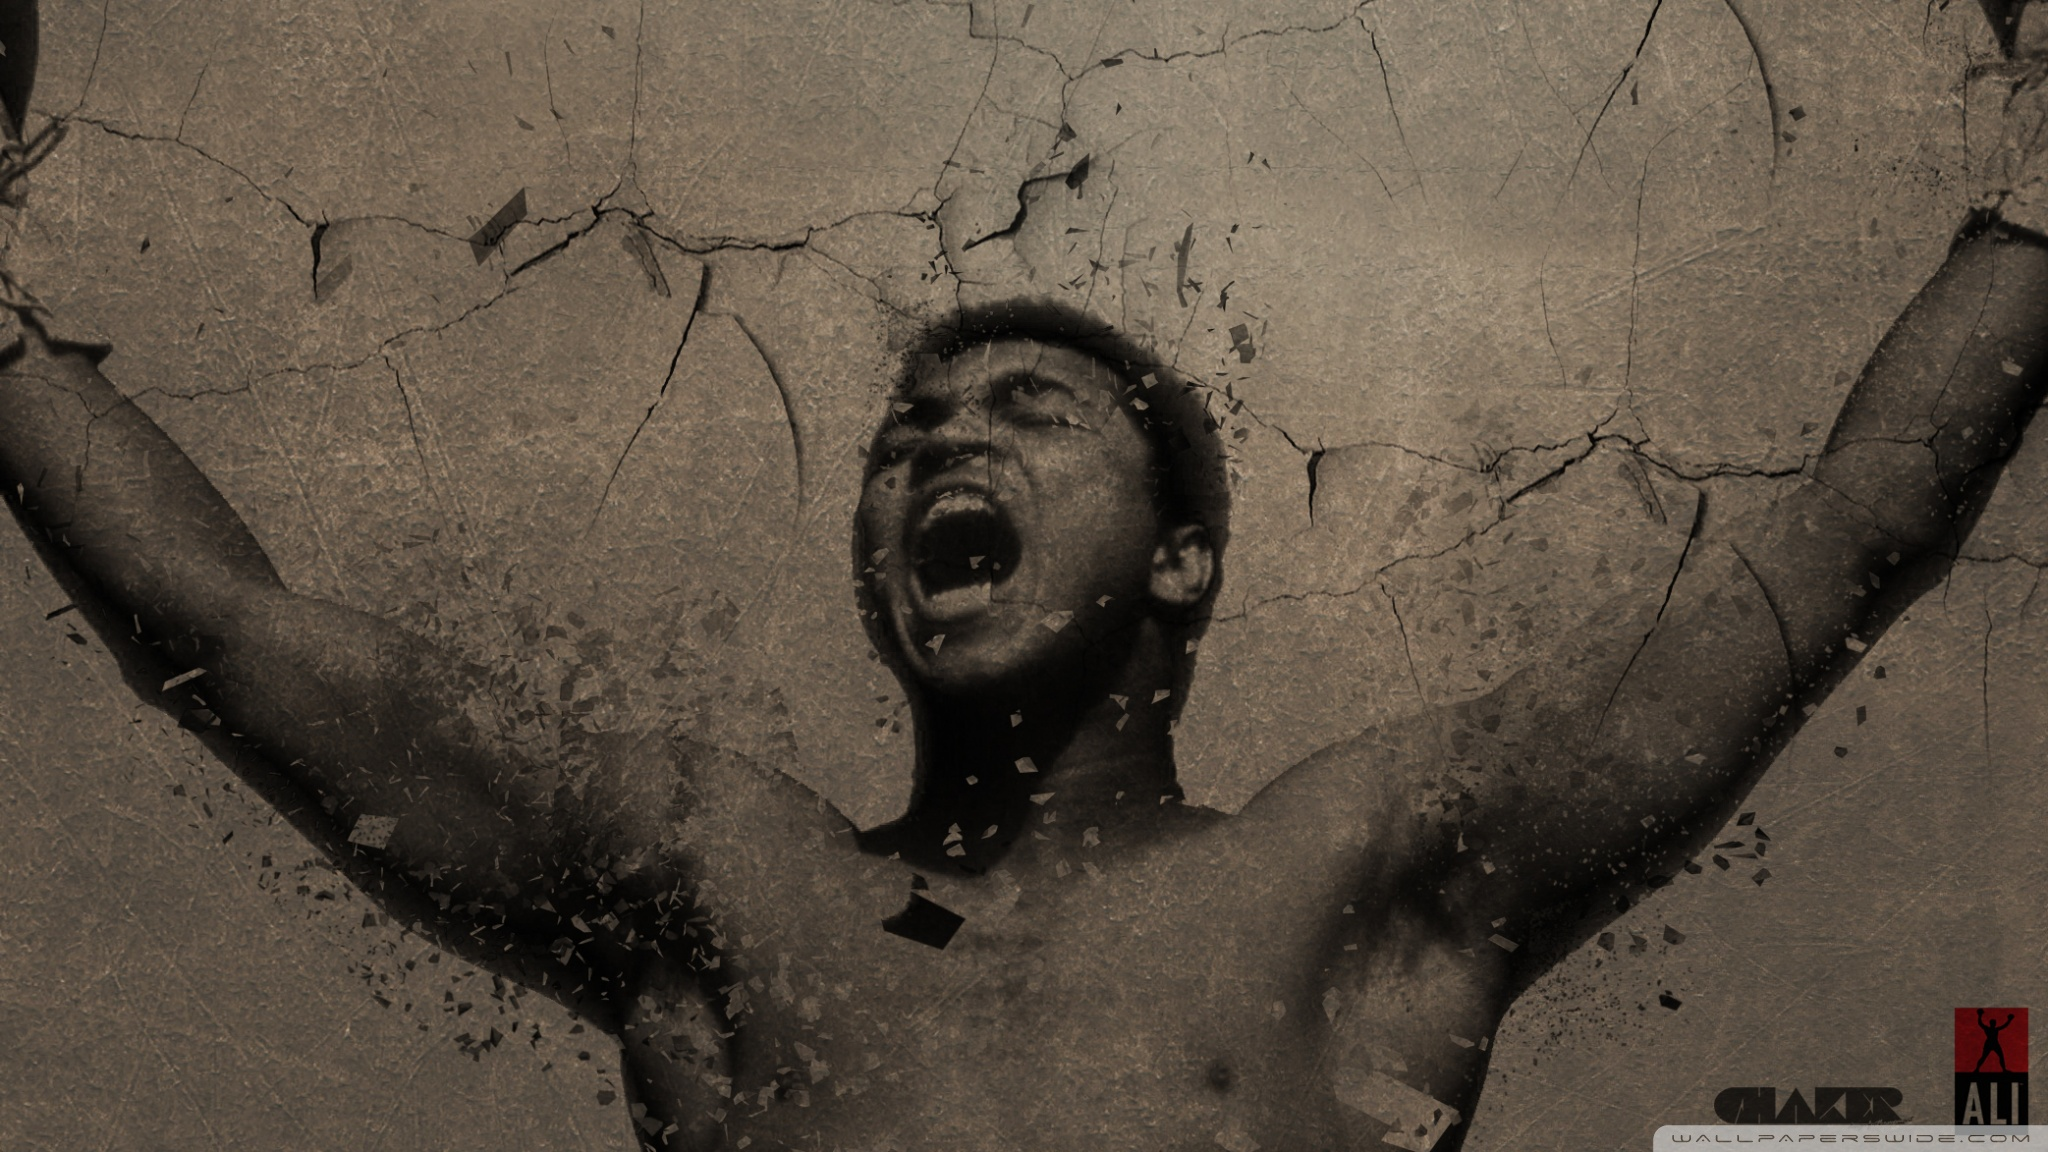 Download Free WallpaperMuhammad Ali